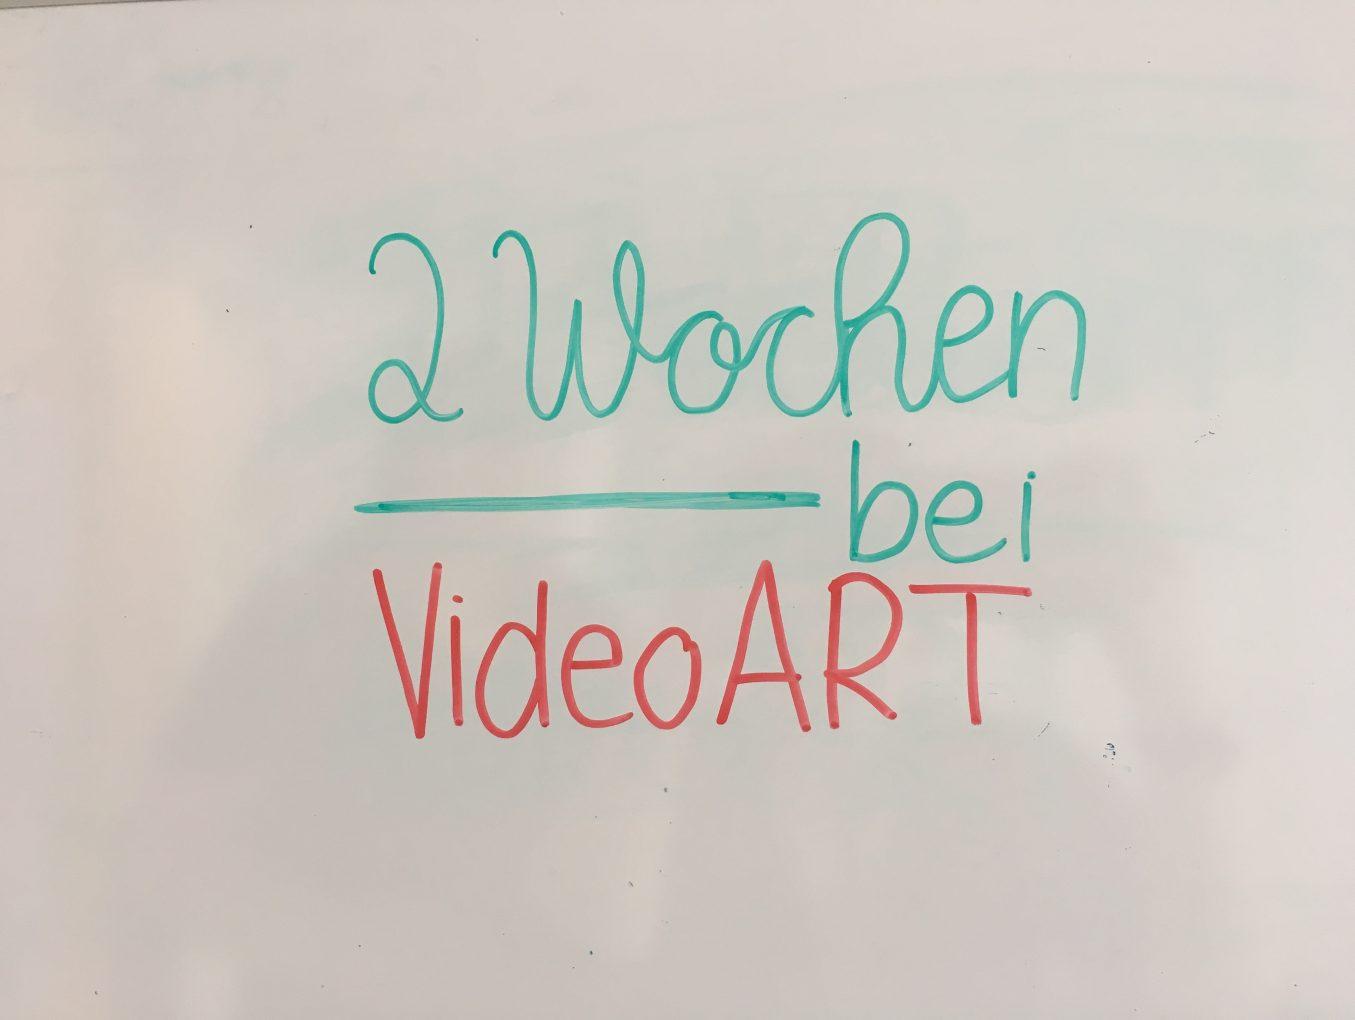 Praktikum bei VideoART